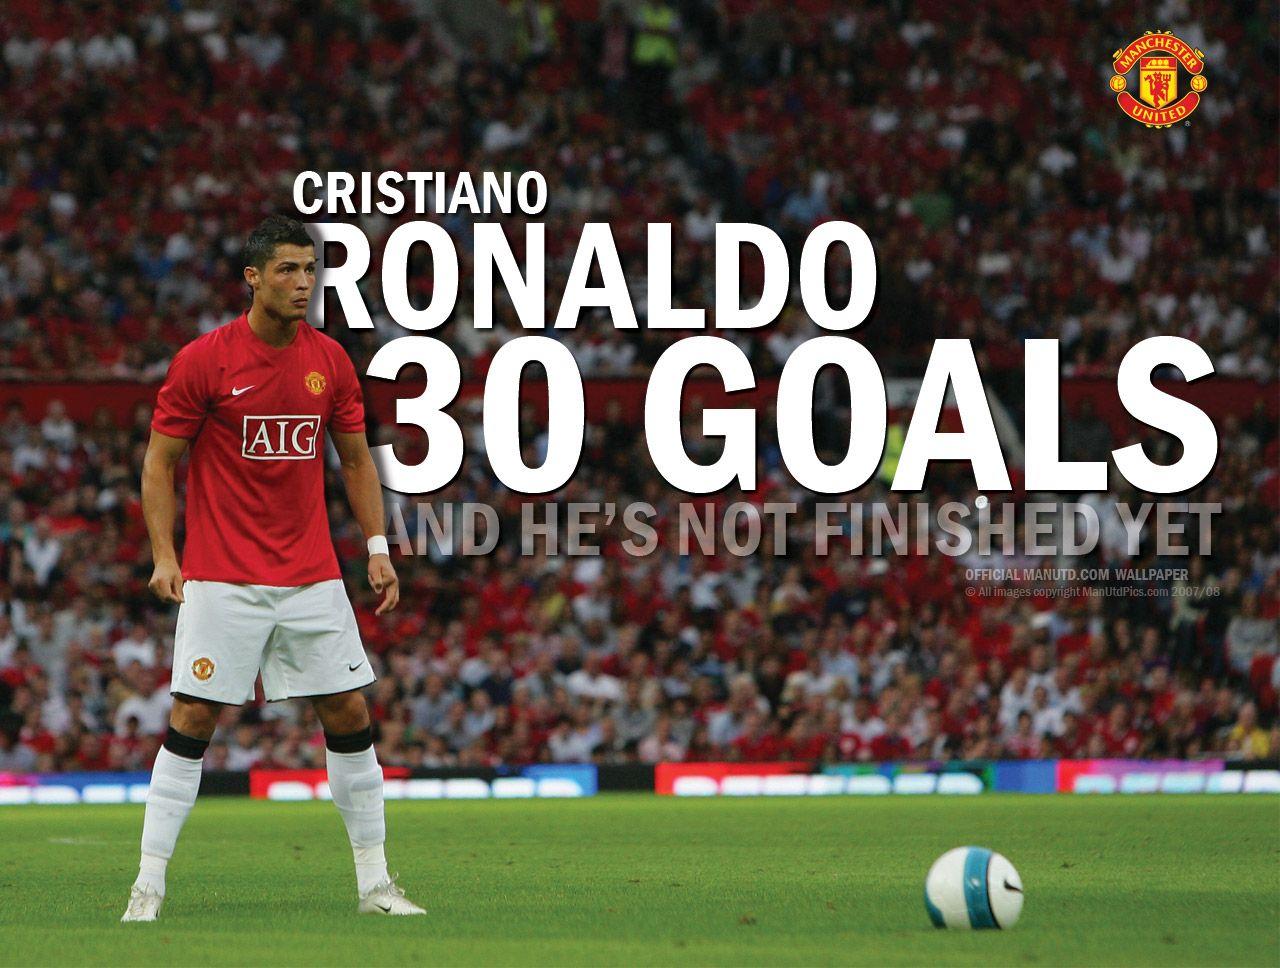 Ronaldo Hd Wallpapers Football Best Desktop Hd Wallpaper Cristiano Ronaldo Wallpapers